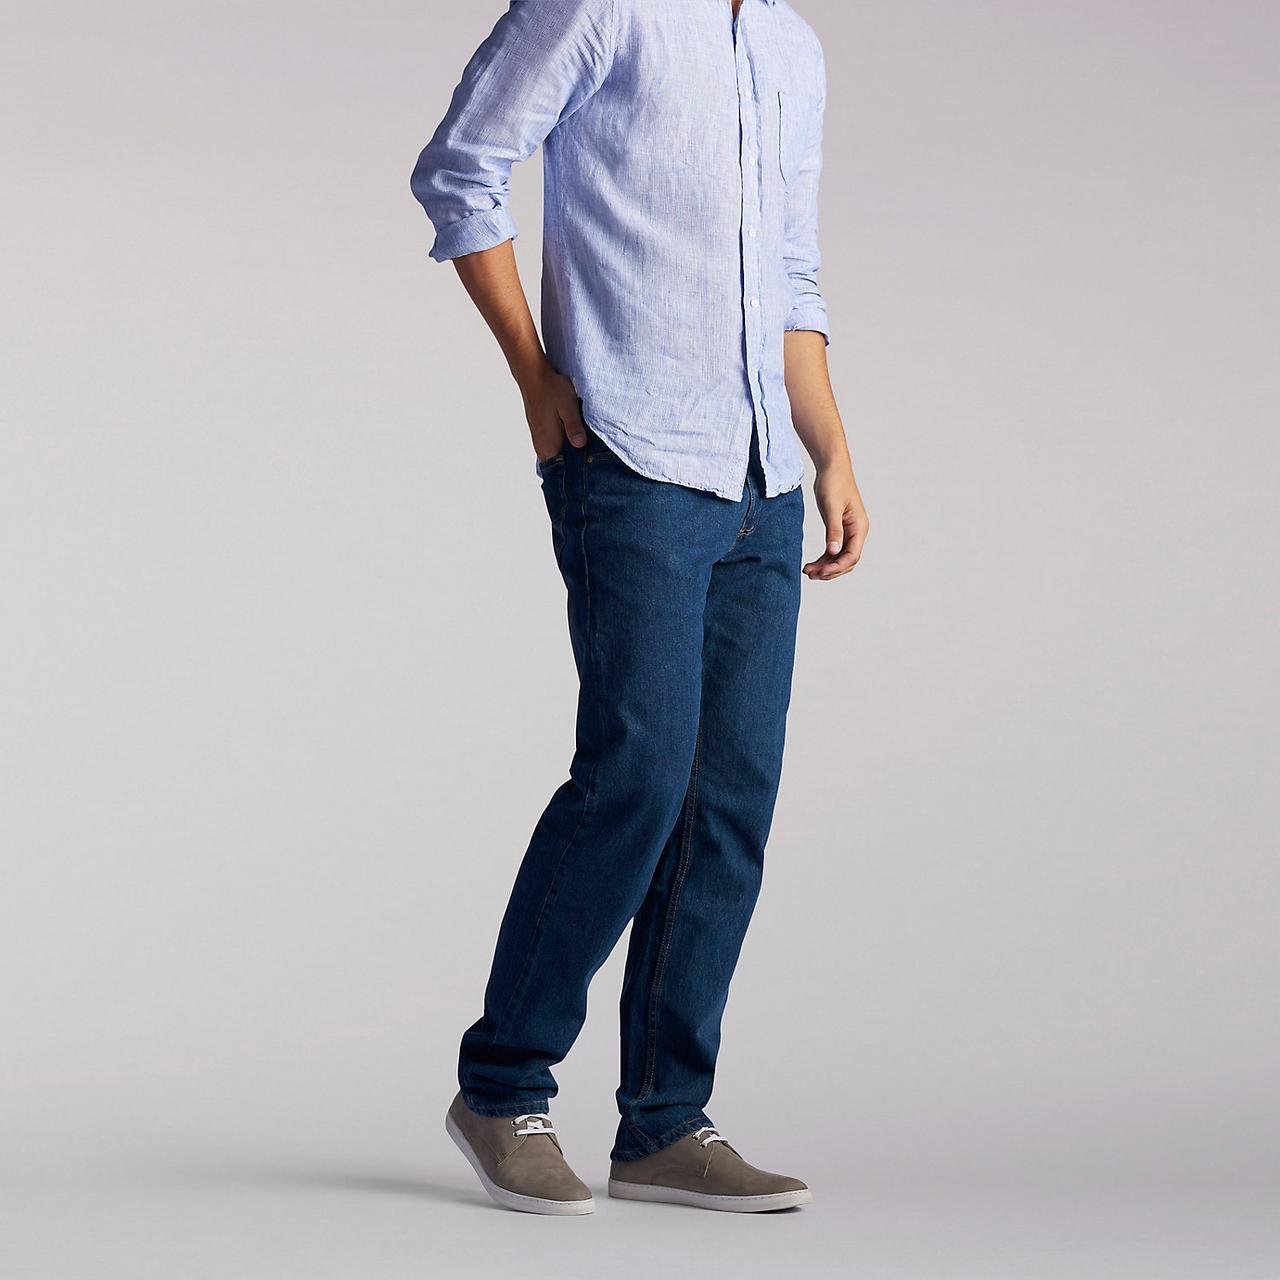 Джинсы Lee Premium Select Regular Fit Straight Leg, Pepper Prewash, 34W29L, 2008989